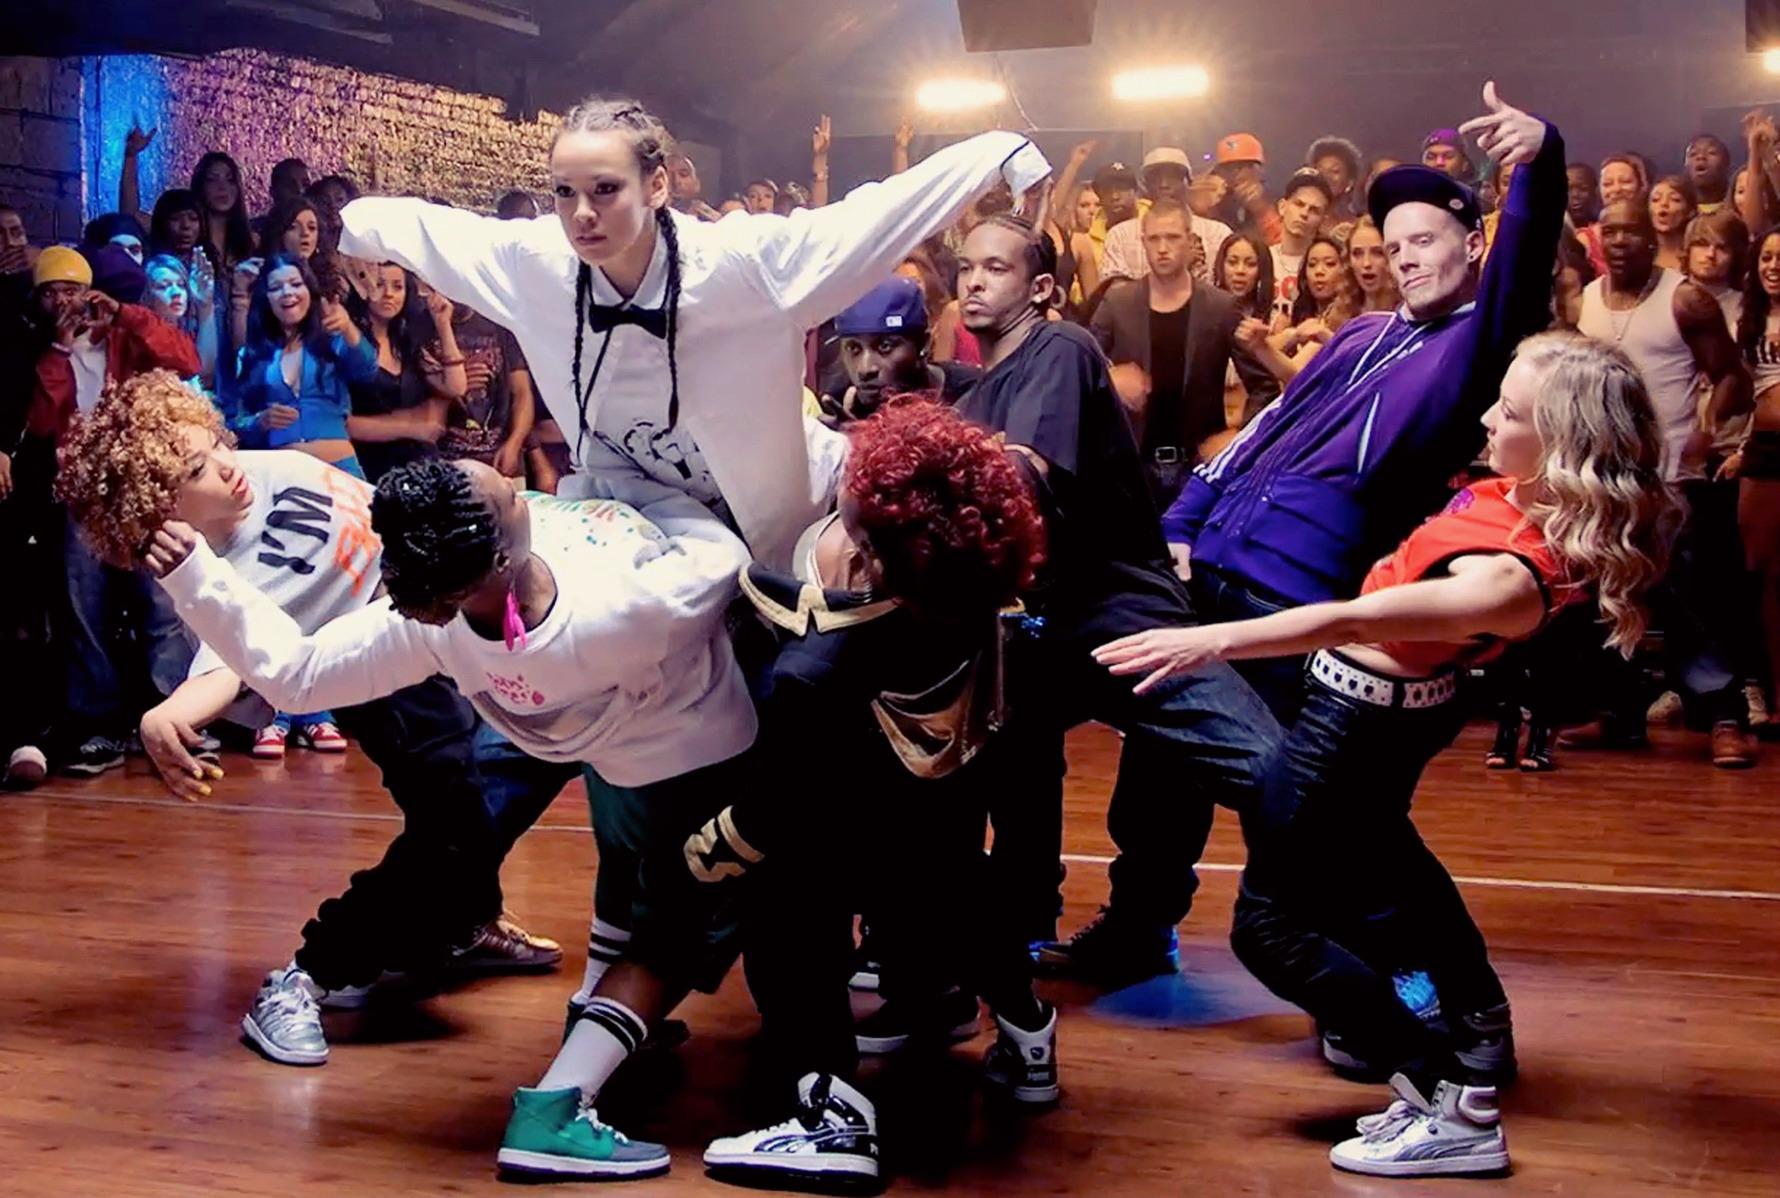 dance artistas: